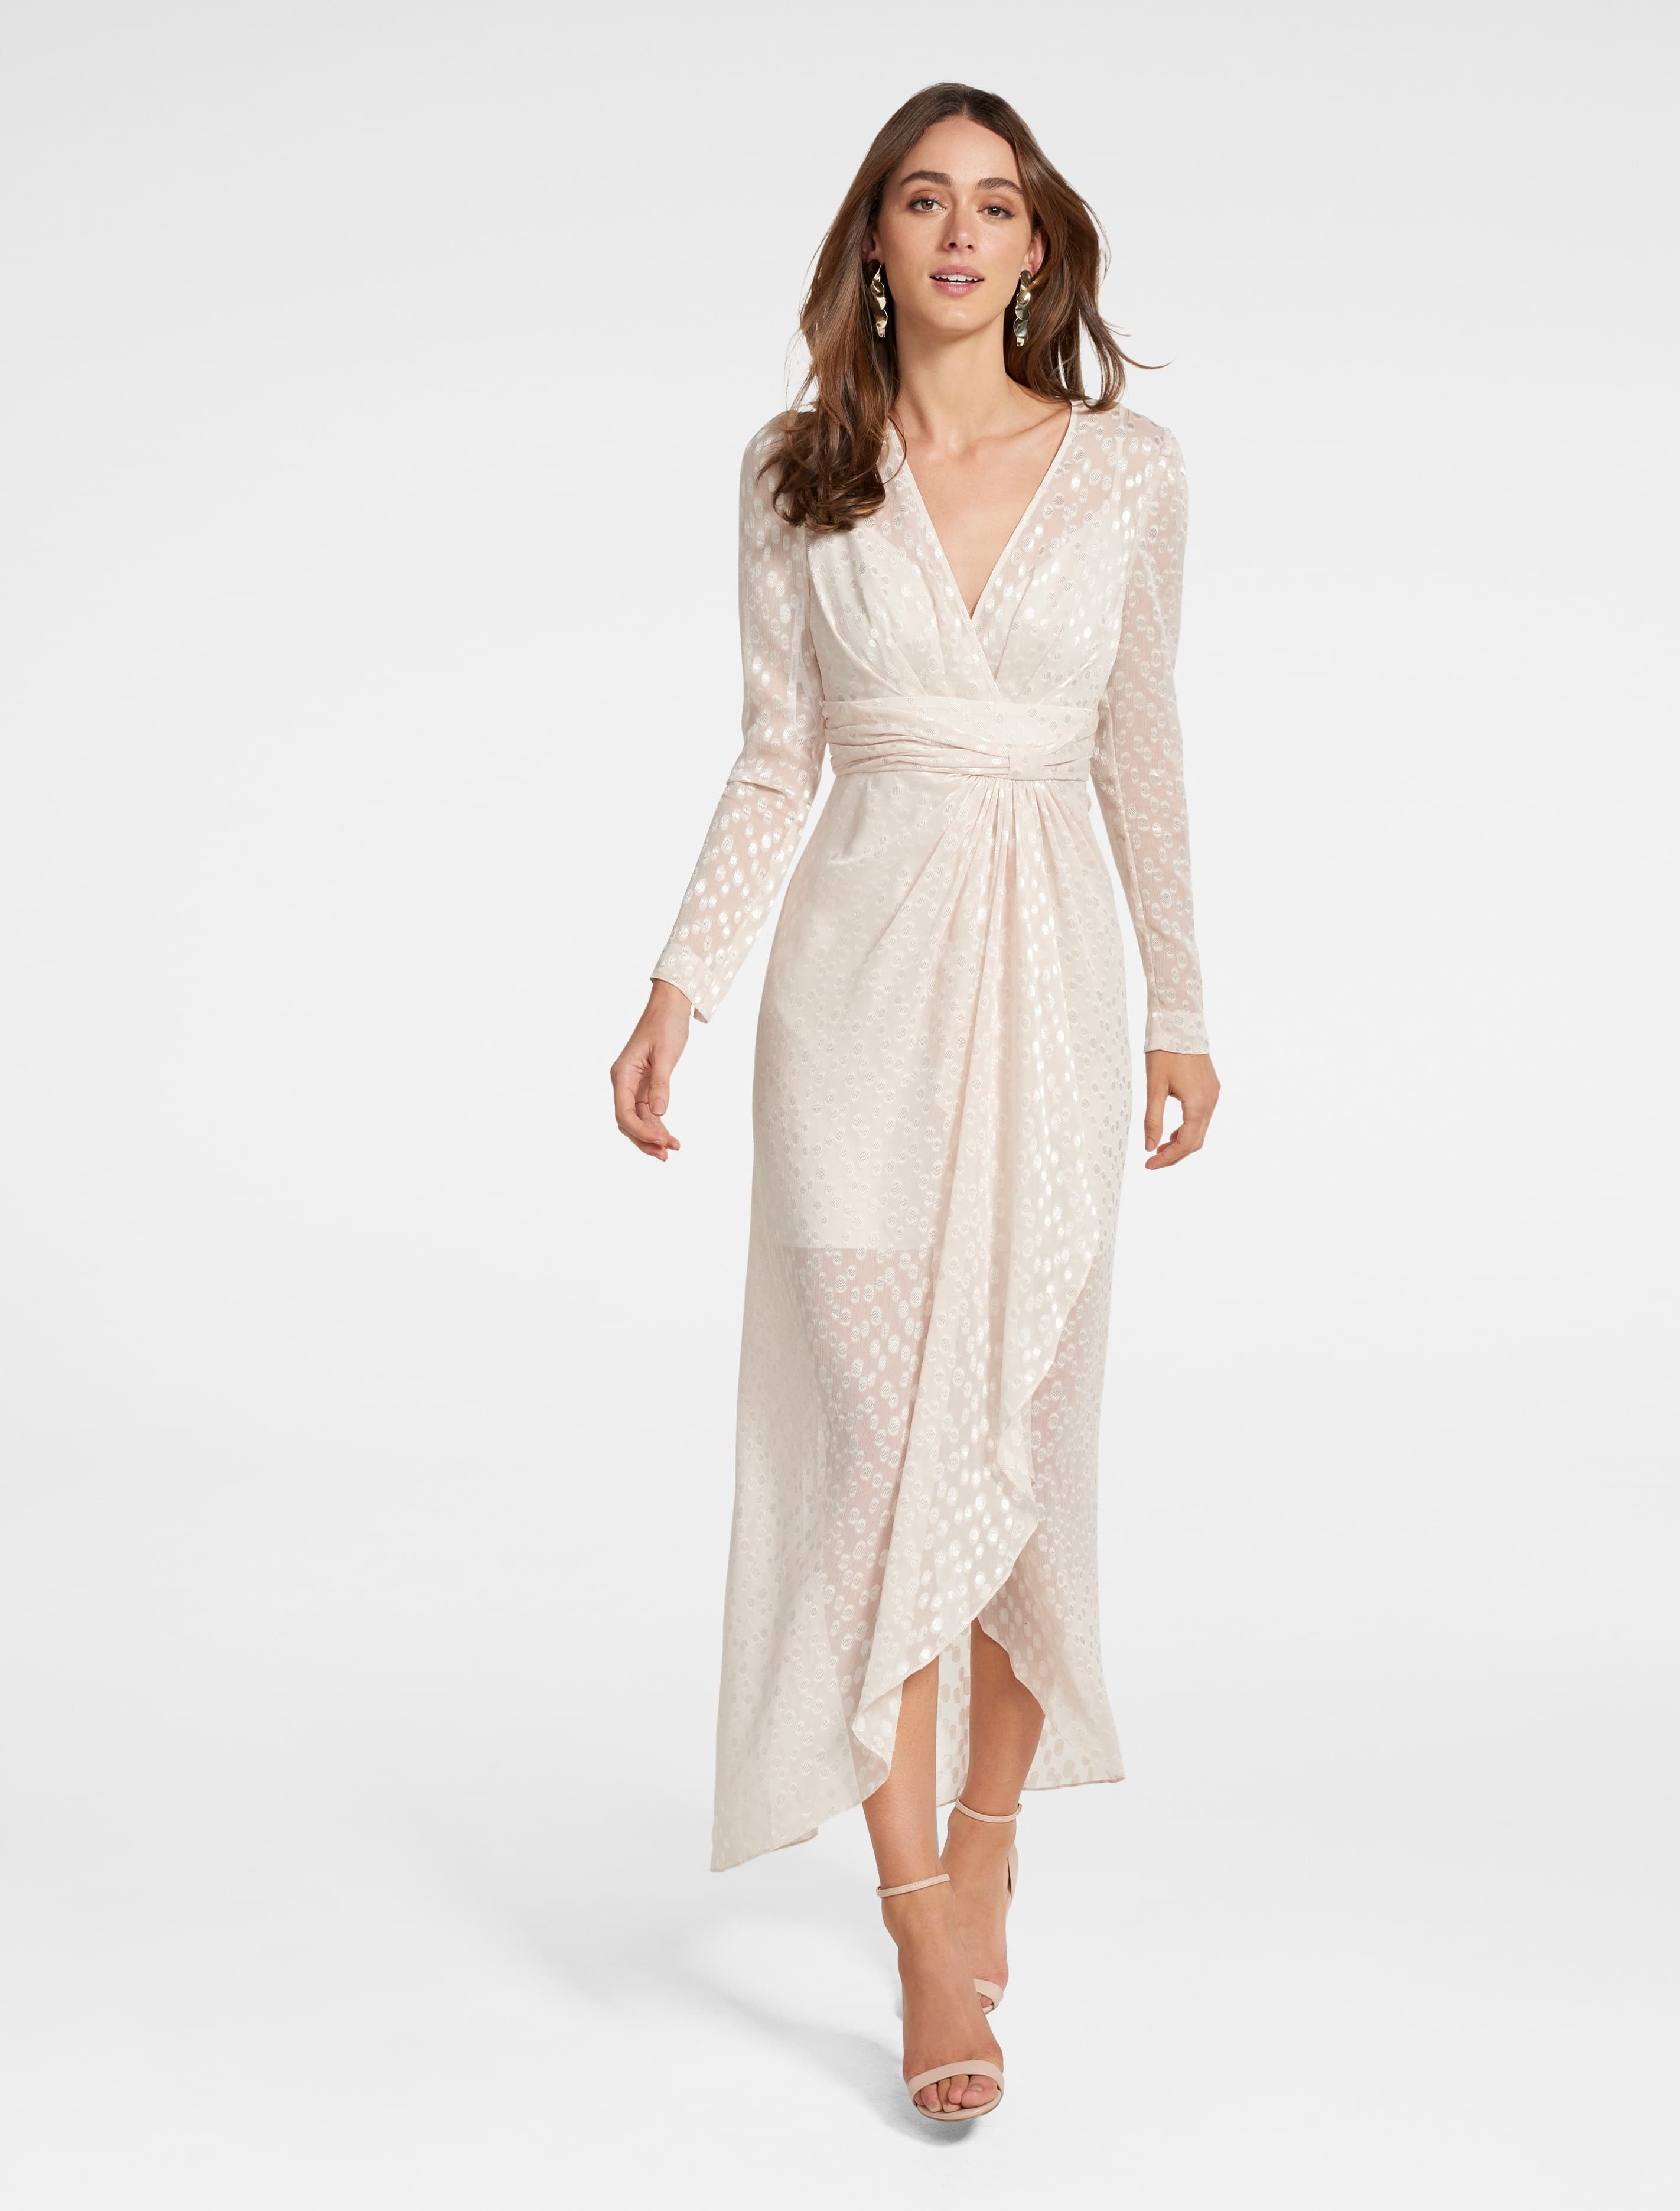 70s Dresses – Disco Dress, Hippie Dress, Wrap Dress Winona Metallic Dress - Cream - 14 $99.95 AT vintagedancer.com